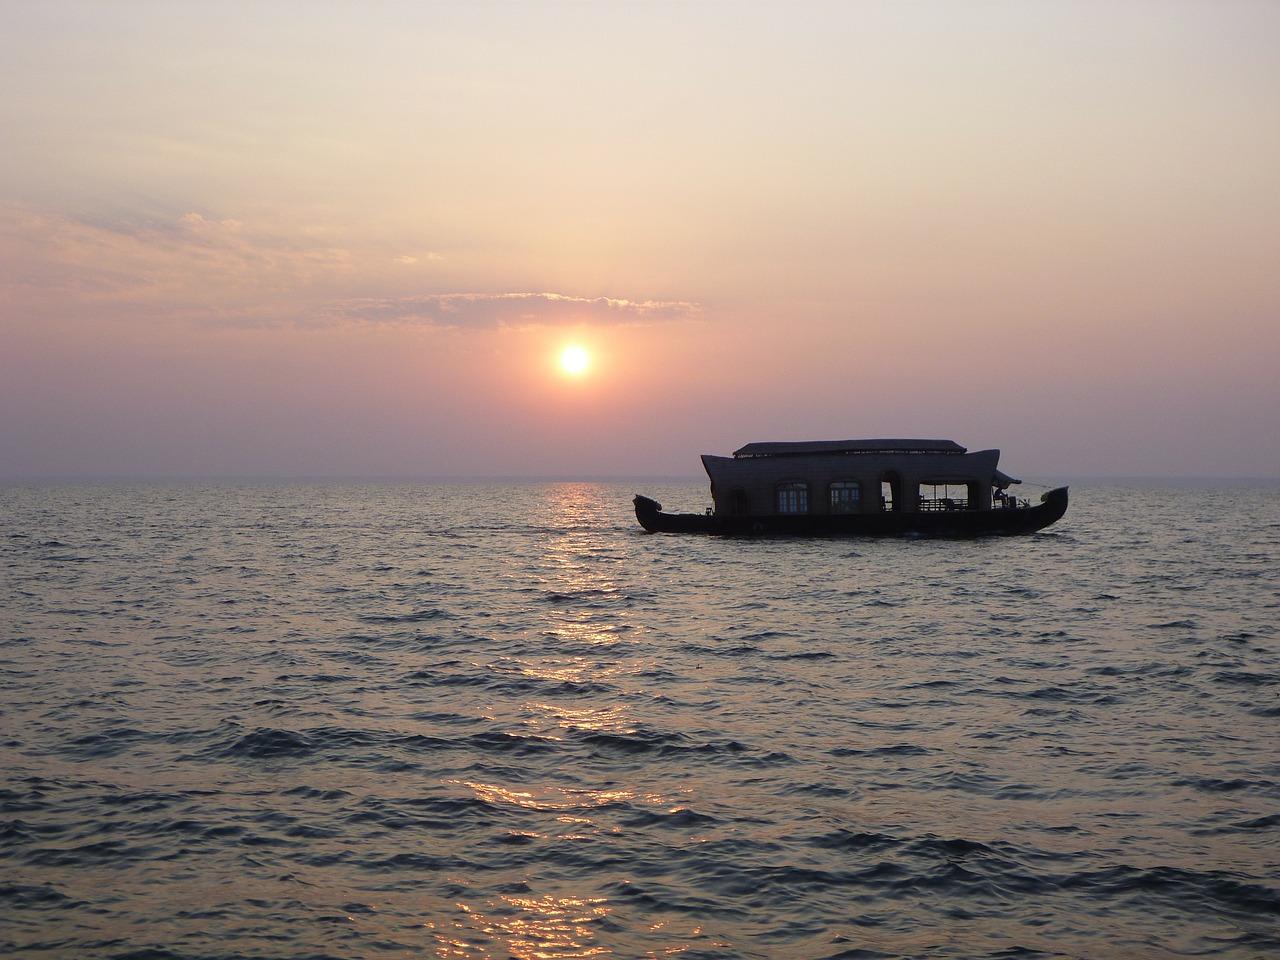 kerala-backwaters-house-boat-cruise-green-country-travel-book-hotels-flights-tours-holidays-visas-travel-insurance